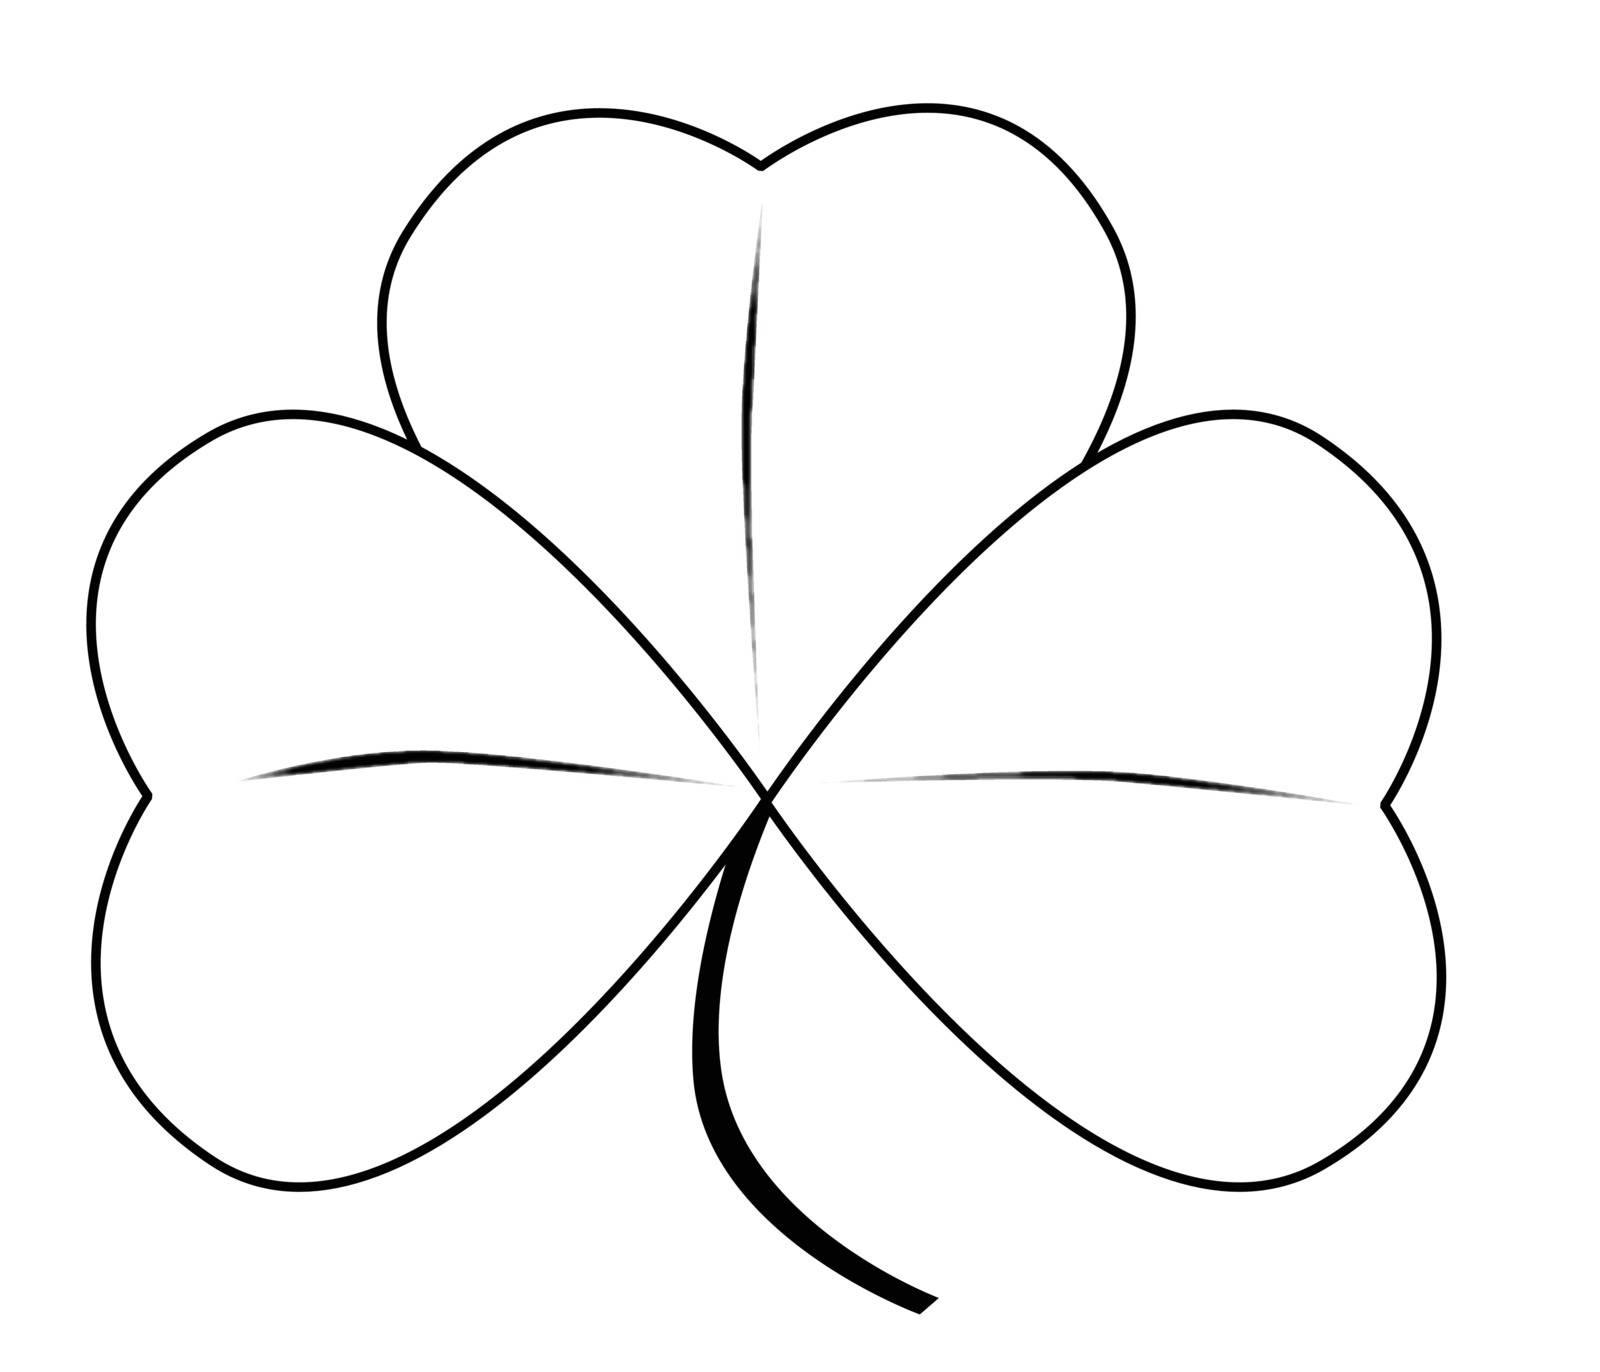 A very lucky Irish shamrock over white.